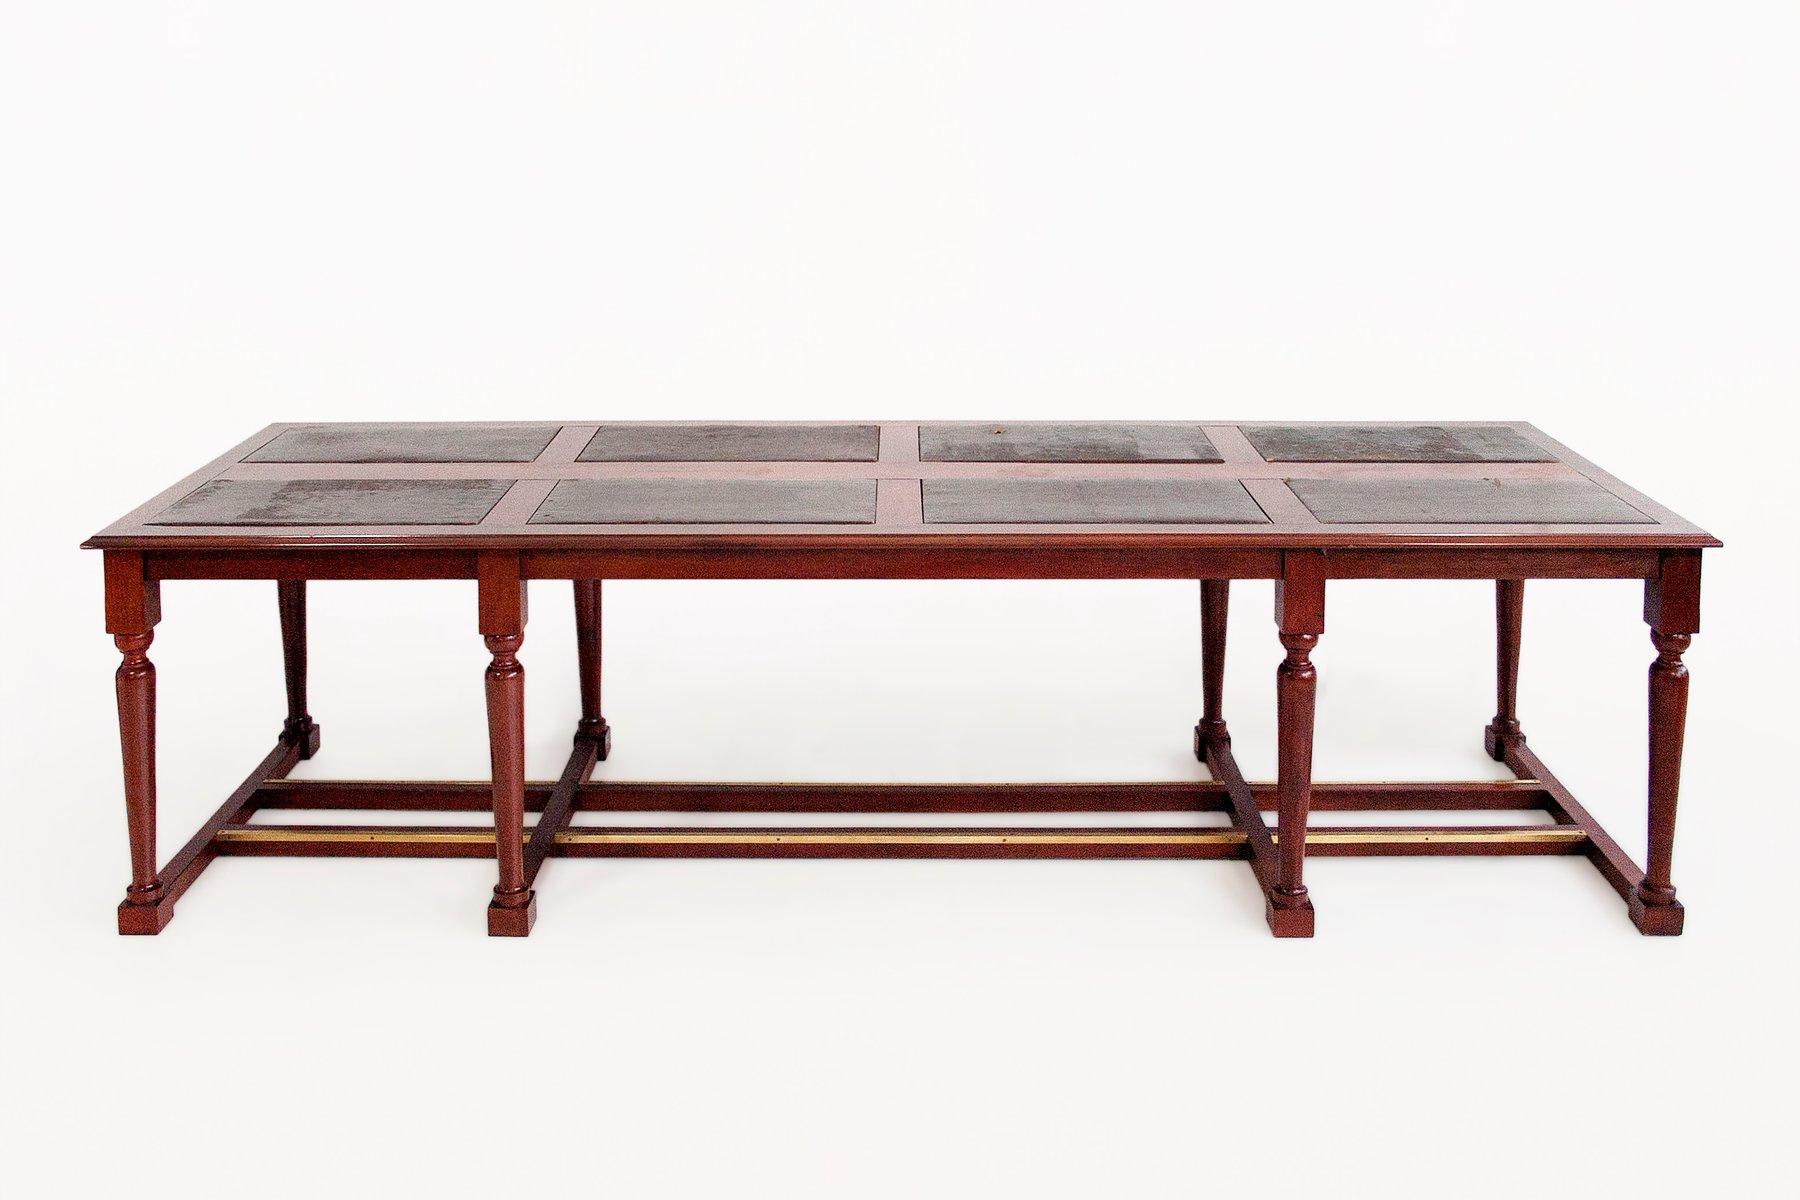 gro er mahagoni bibliothek tisch 19 jh bei pamono kaufen. Black Bedroom Furniture Sets. Home Design Ideas